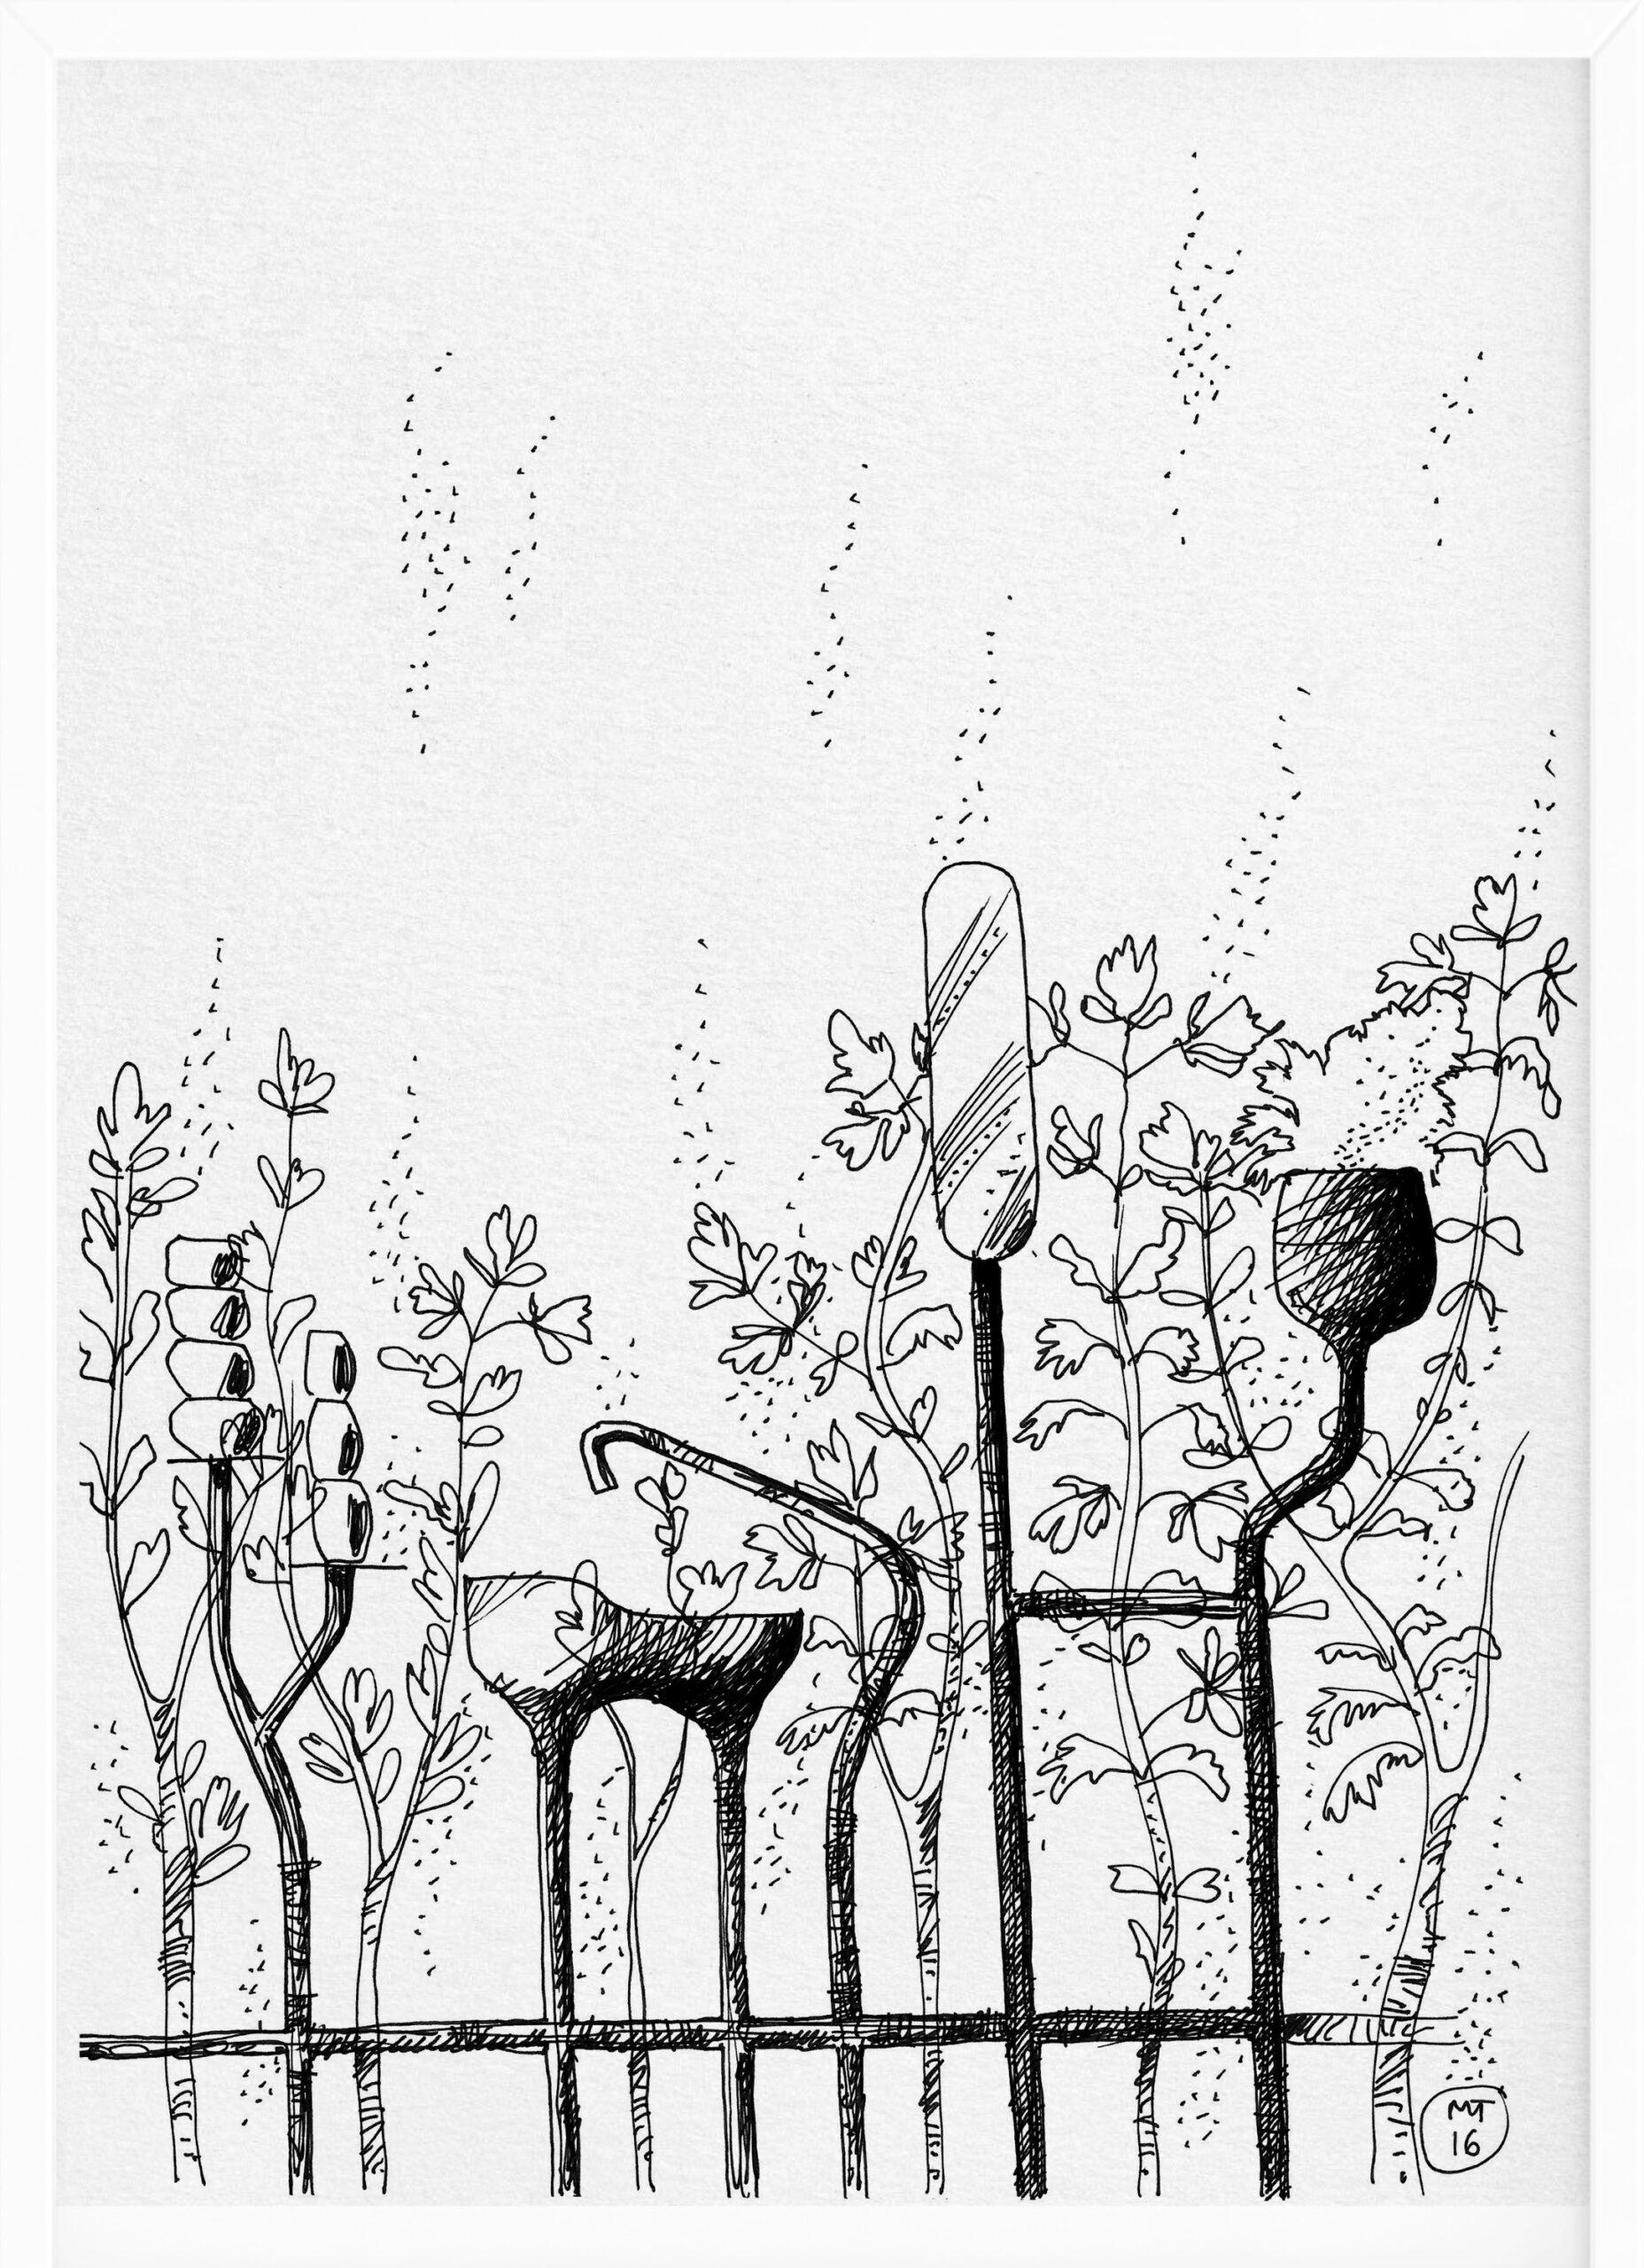 Rain | Drawings | Mario Trimarchi Design4